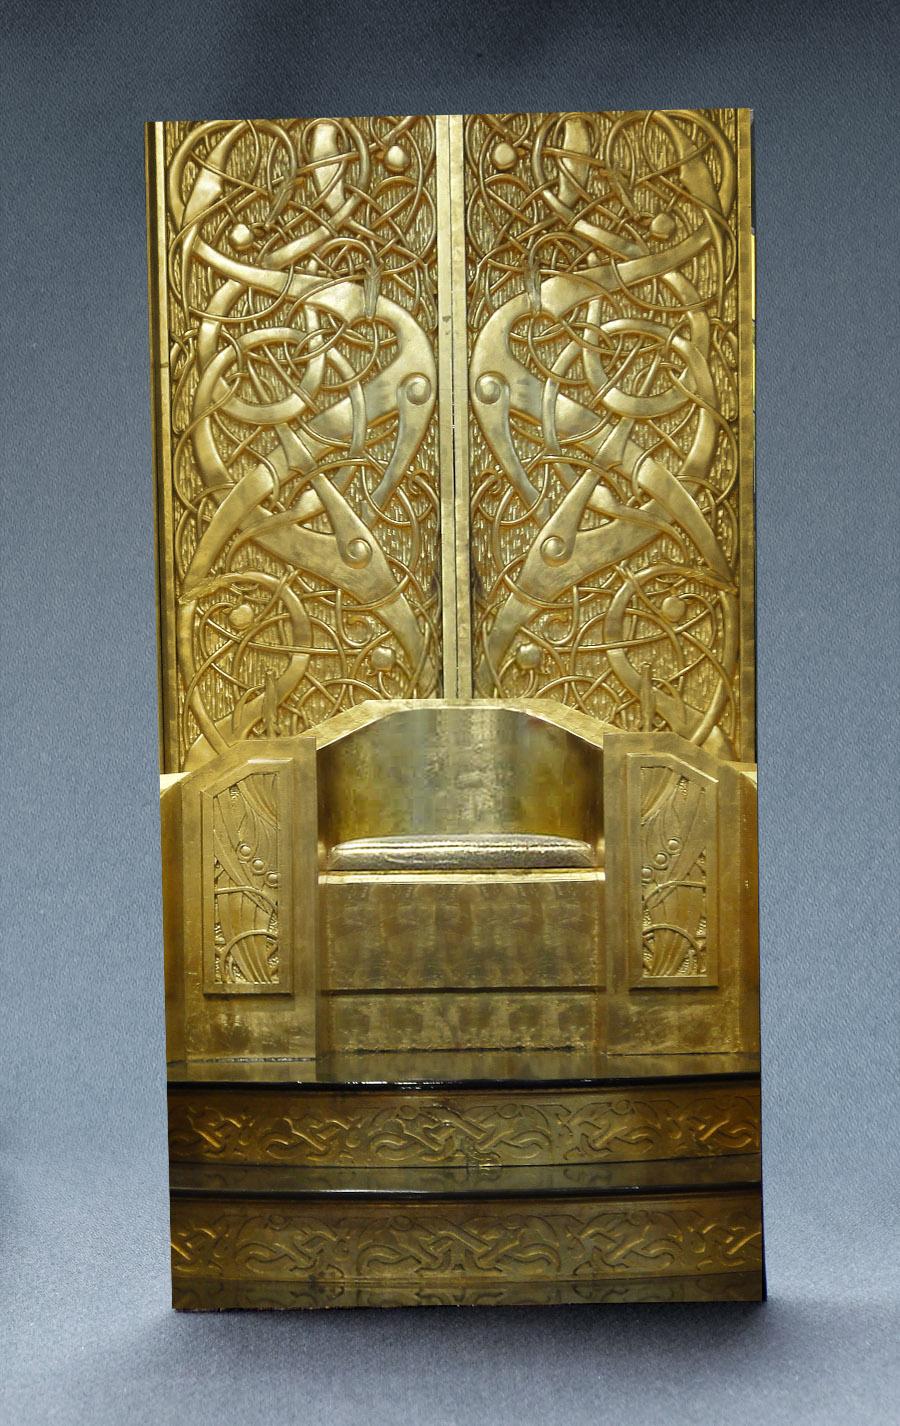 Golden Throne 1:6 Scale Striking Backdrop